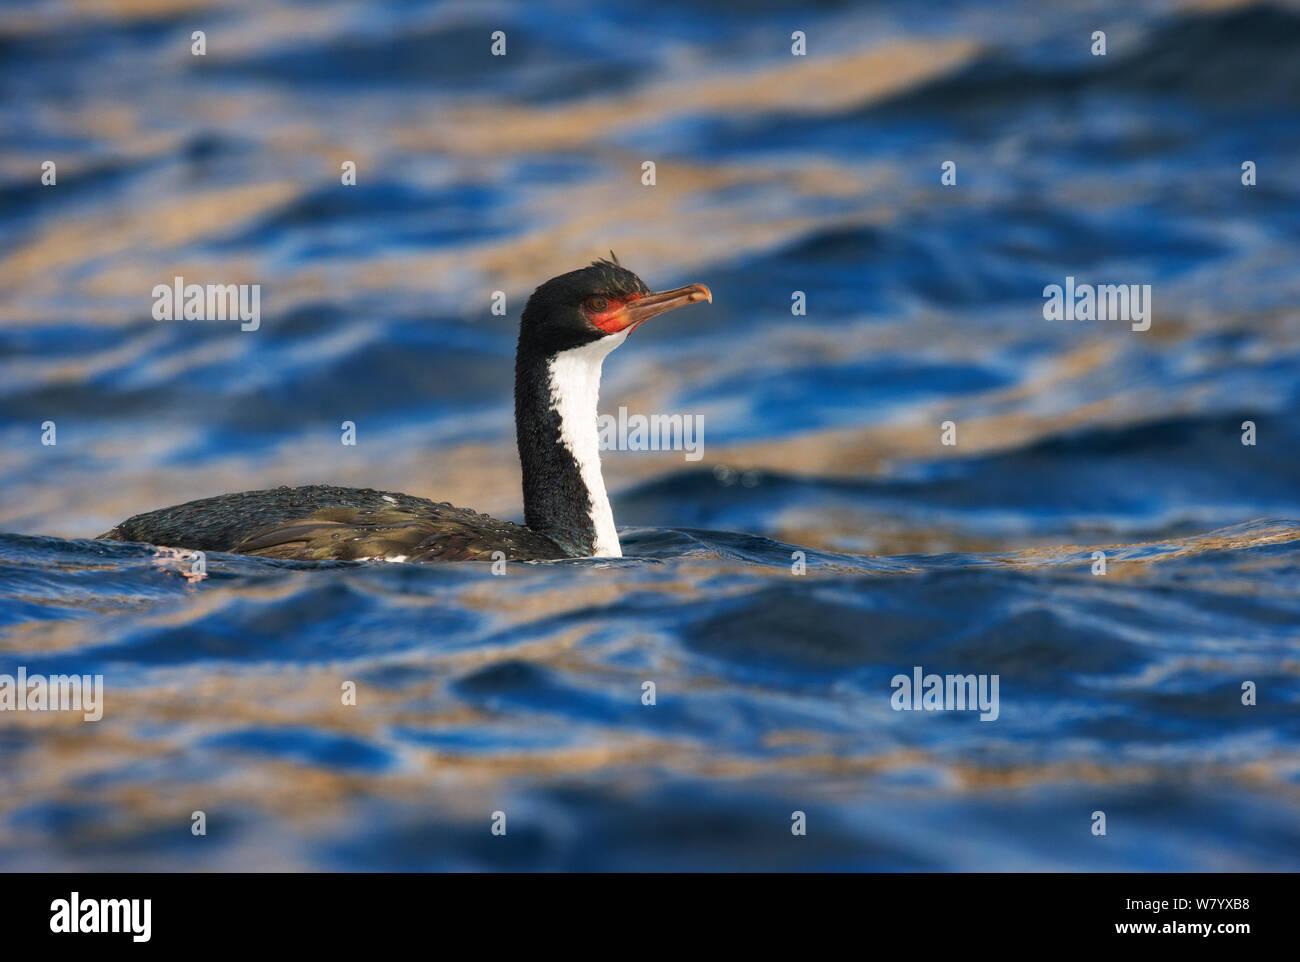 Bounty shag (Phalacrocorax ranfurlyi) swimming near Bounty Island, Sub-Antarctic New Zealand, March. Vulnerable species. Stock Photo